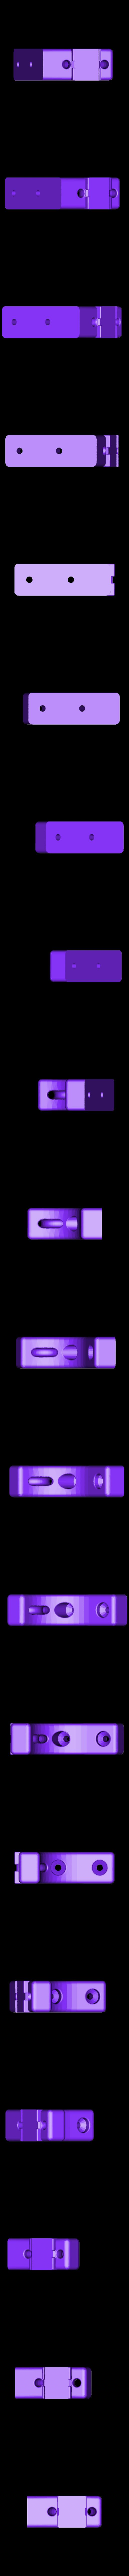 LED-Strip-Holder.stl Télécharger fichier STL gratuit Support de bande lumineuse à LED • Objet à imprimer en 3D, markusg